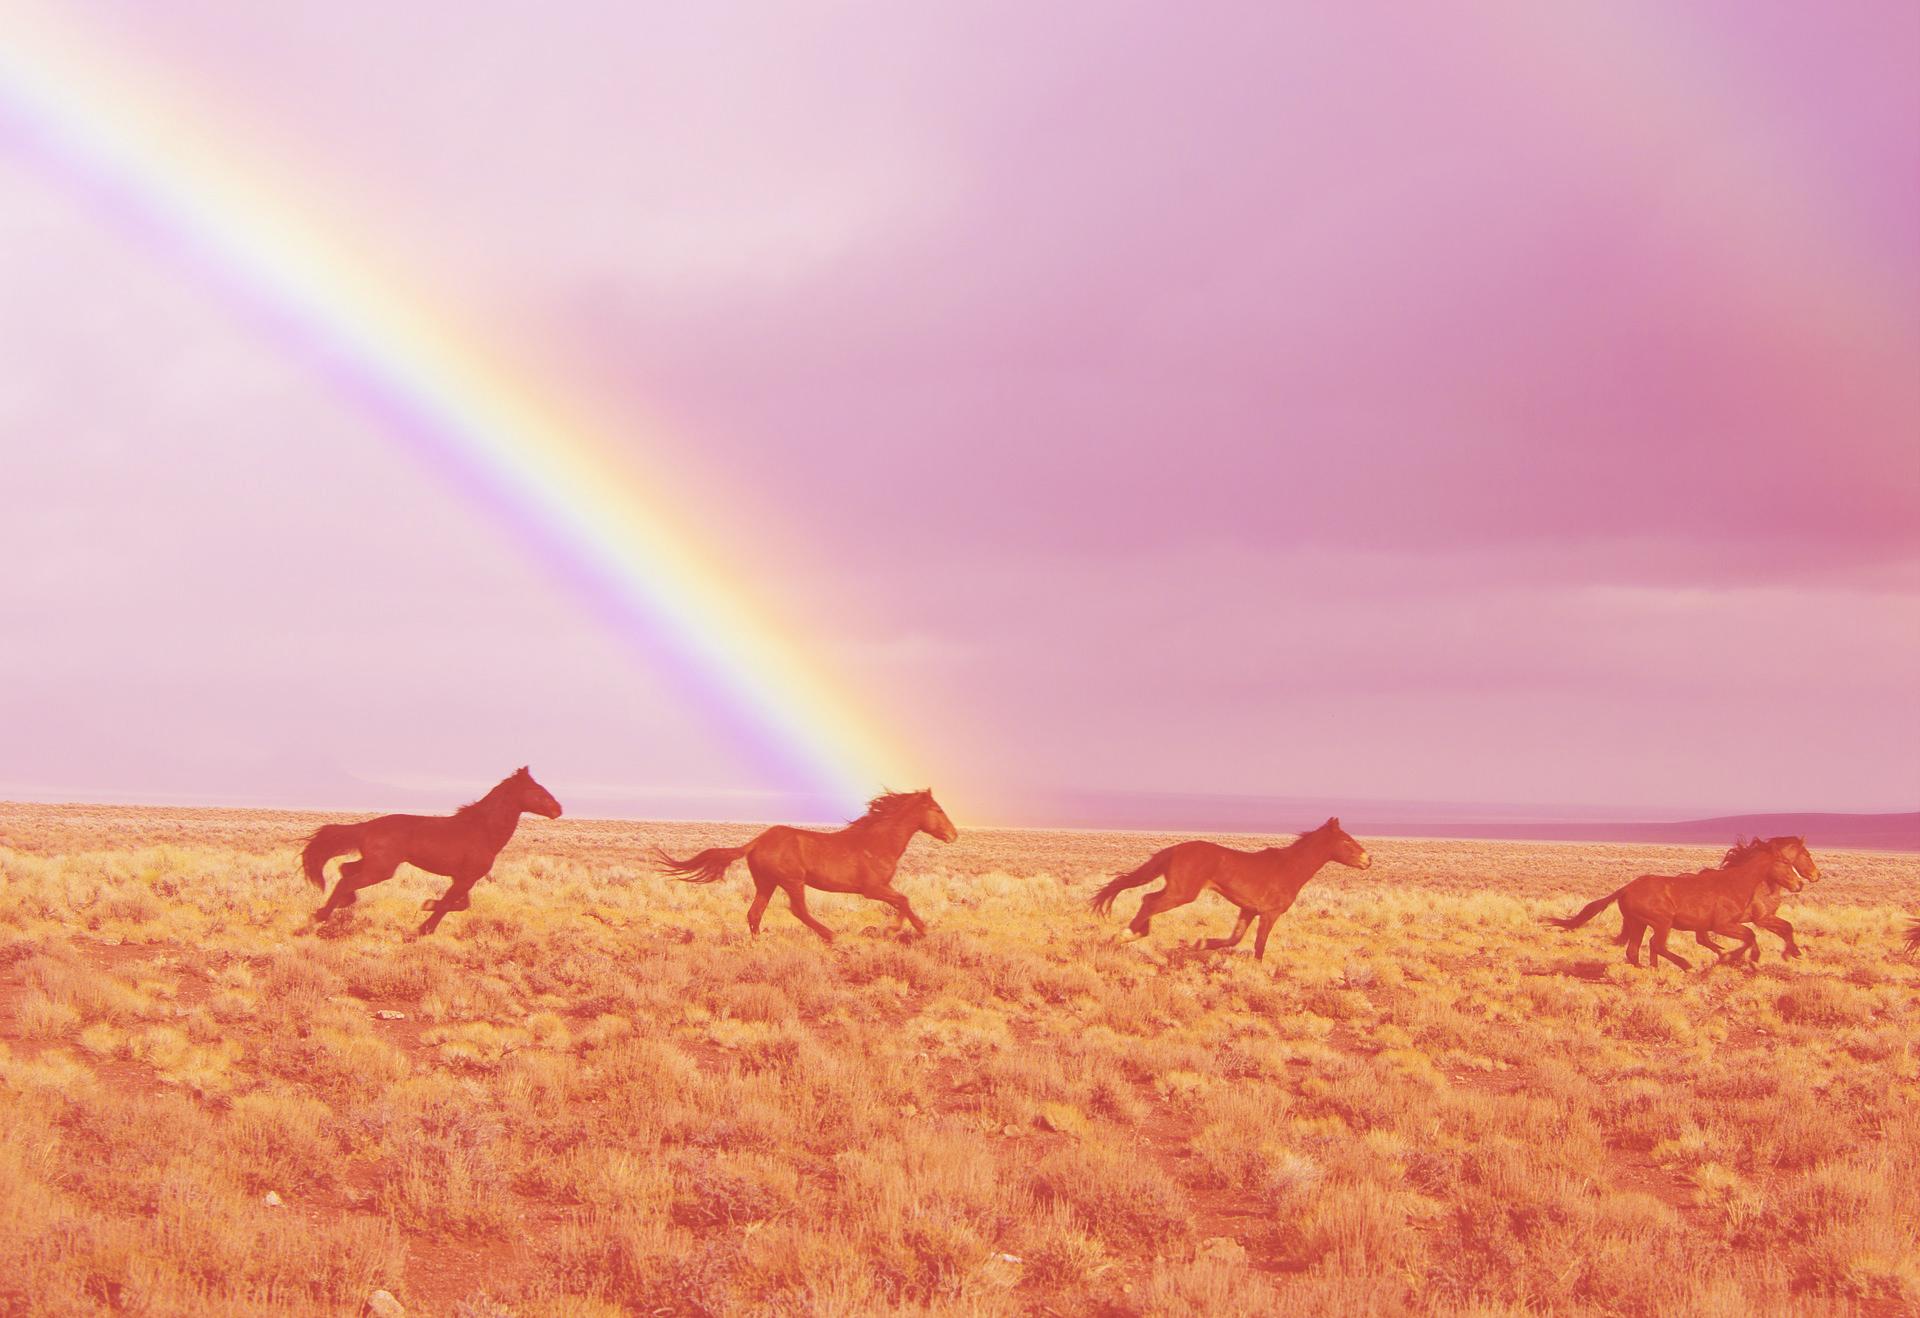 wild-horses-2239420_1920_color.jpg